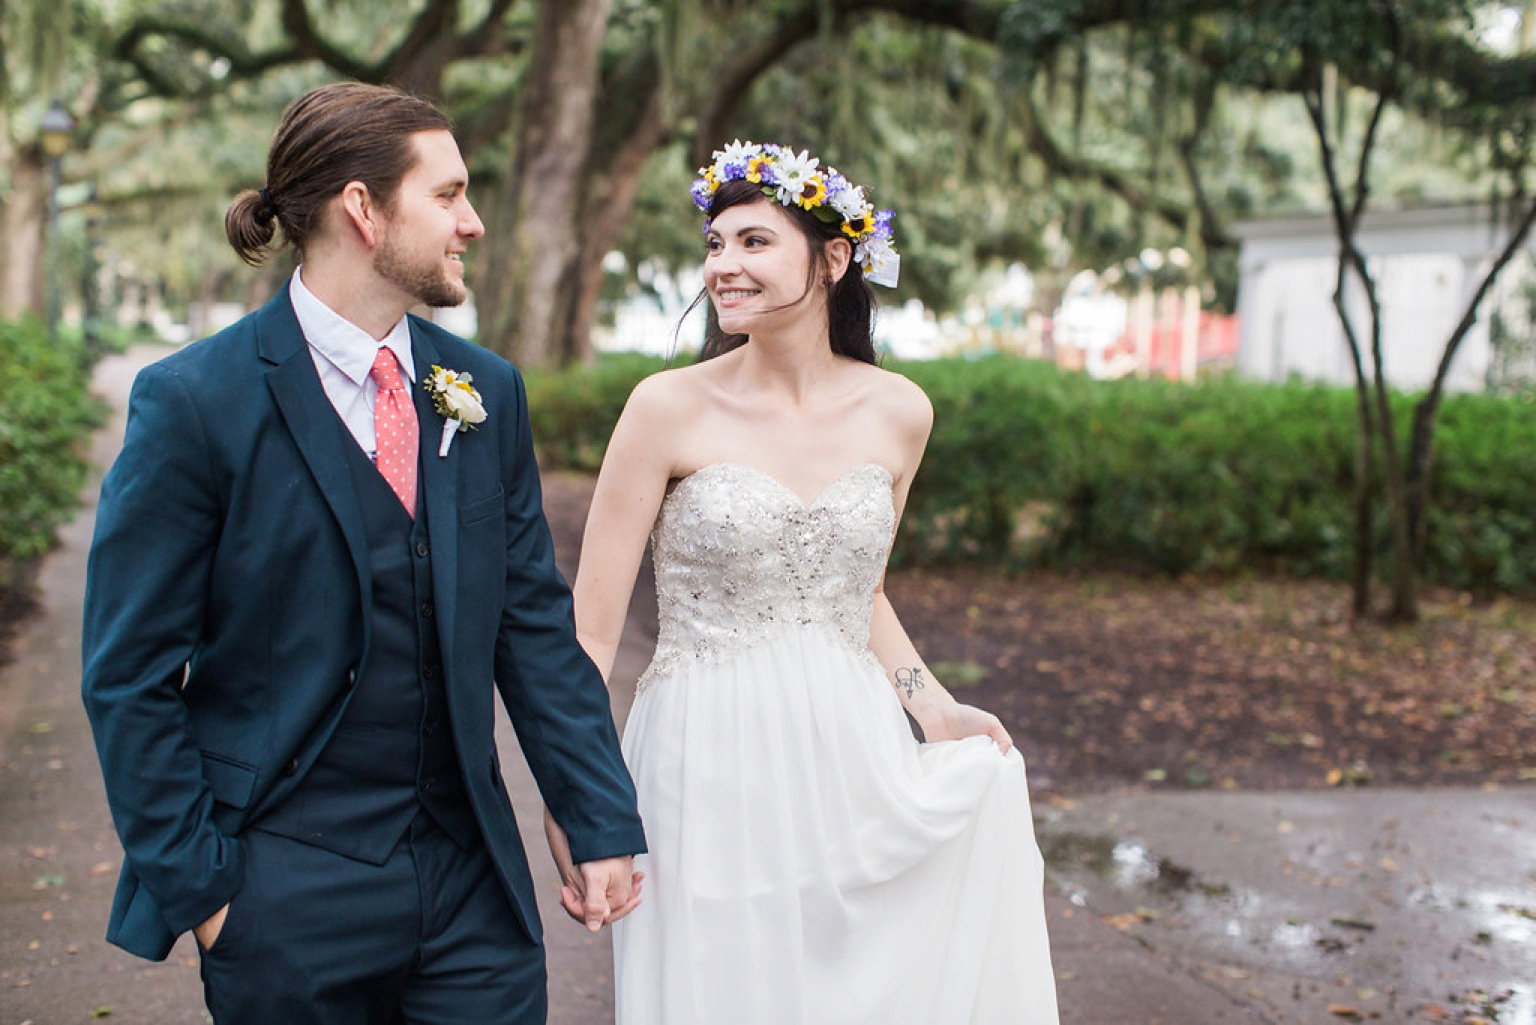 Apt_B_Photo_Savannah_Wedding_Photographer_Flower_Crown048.JPG